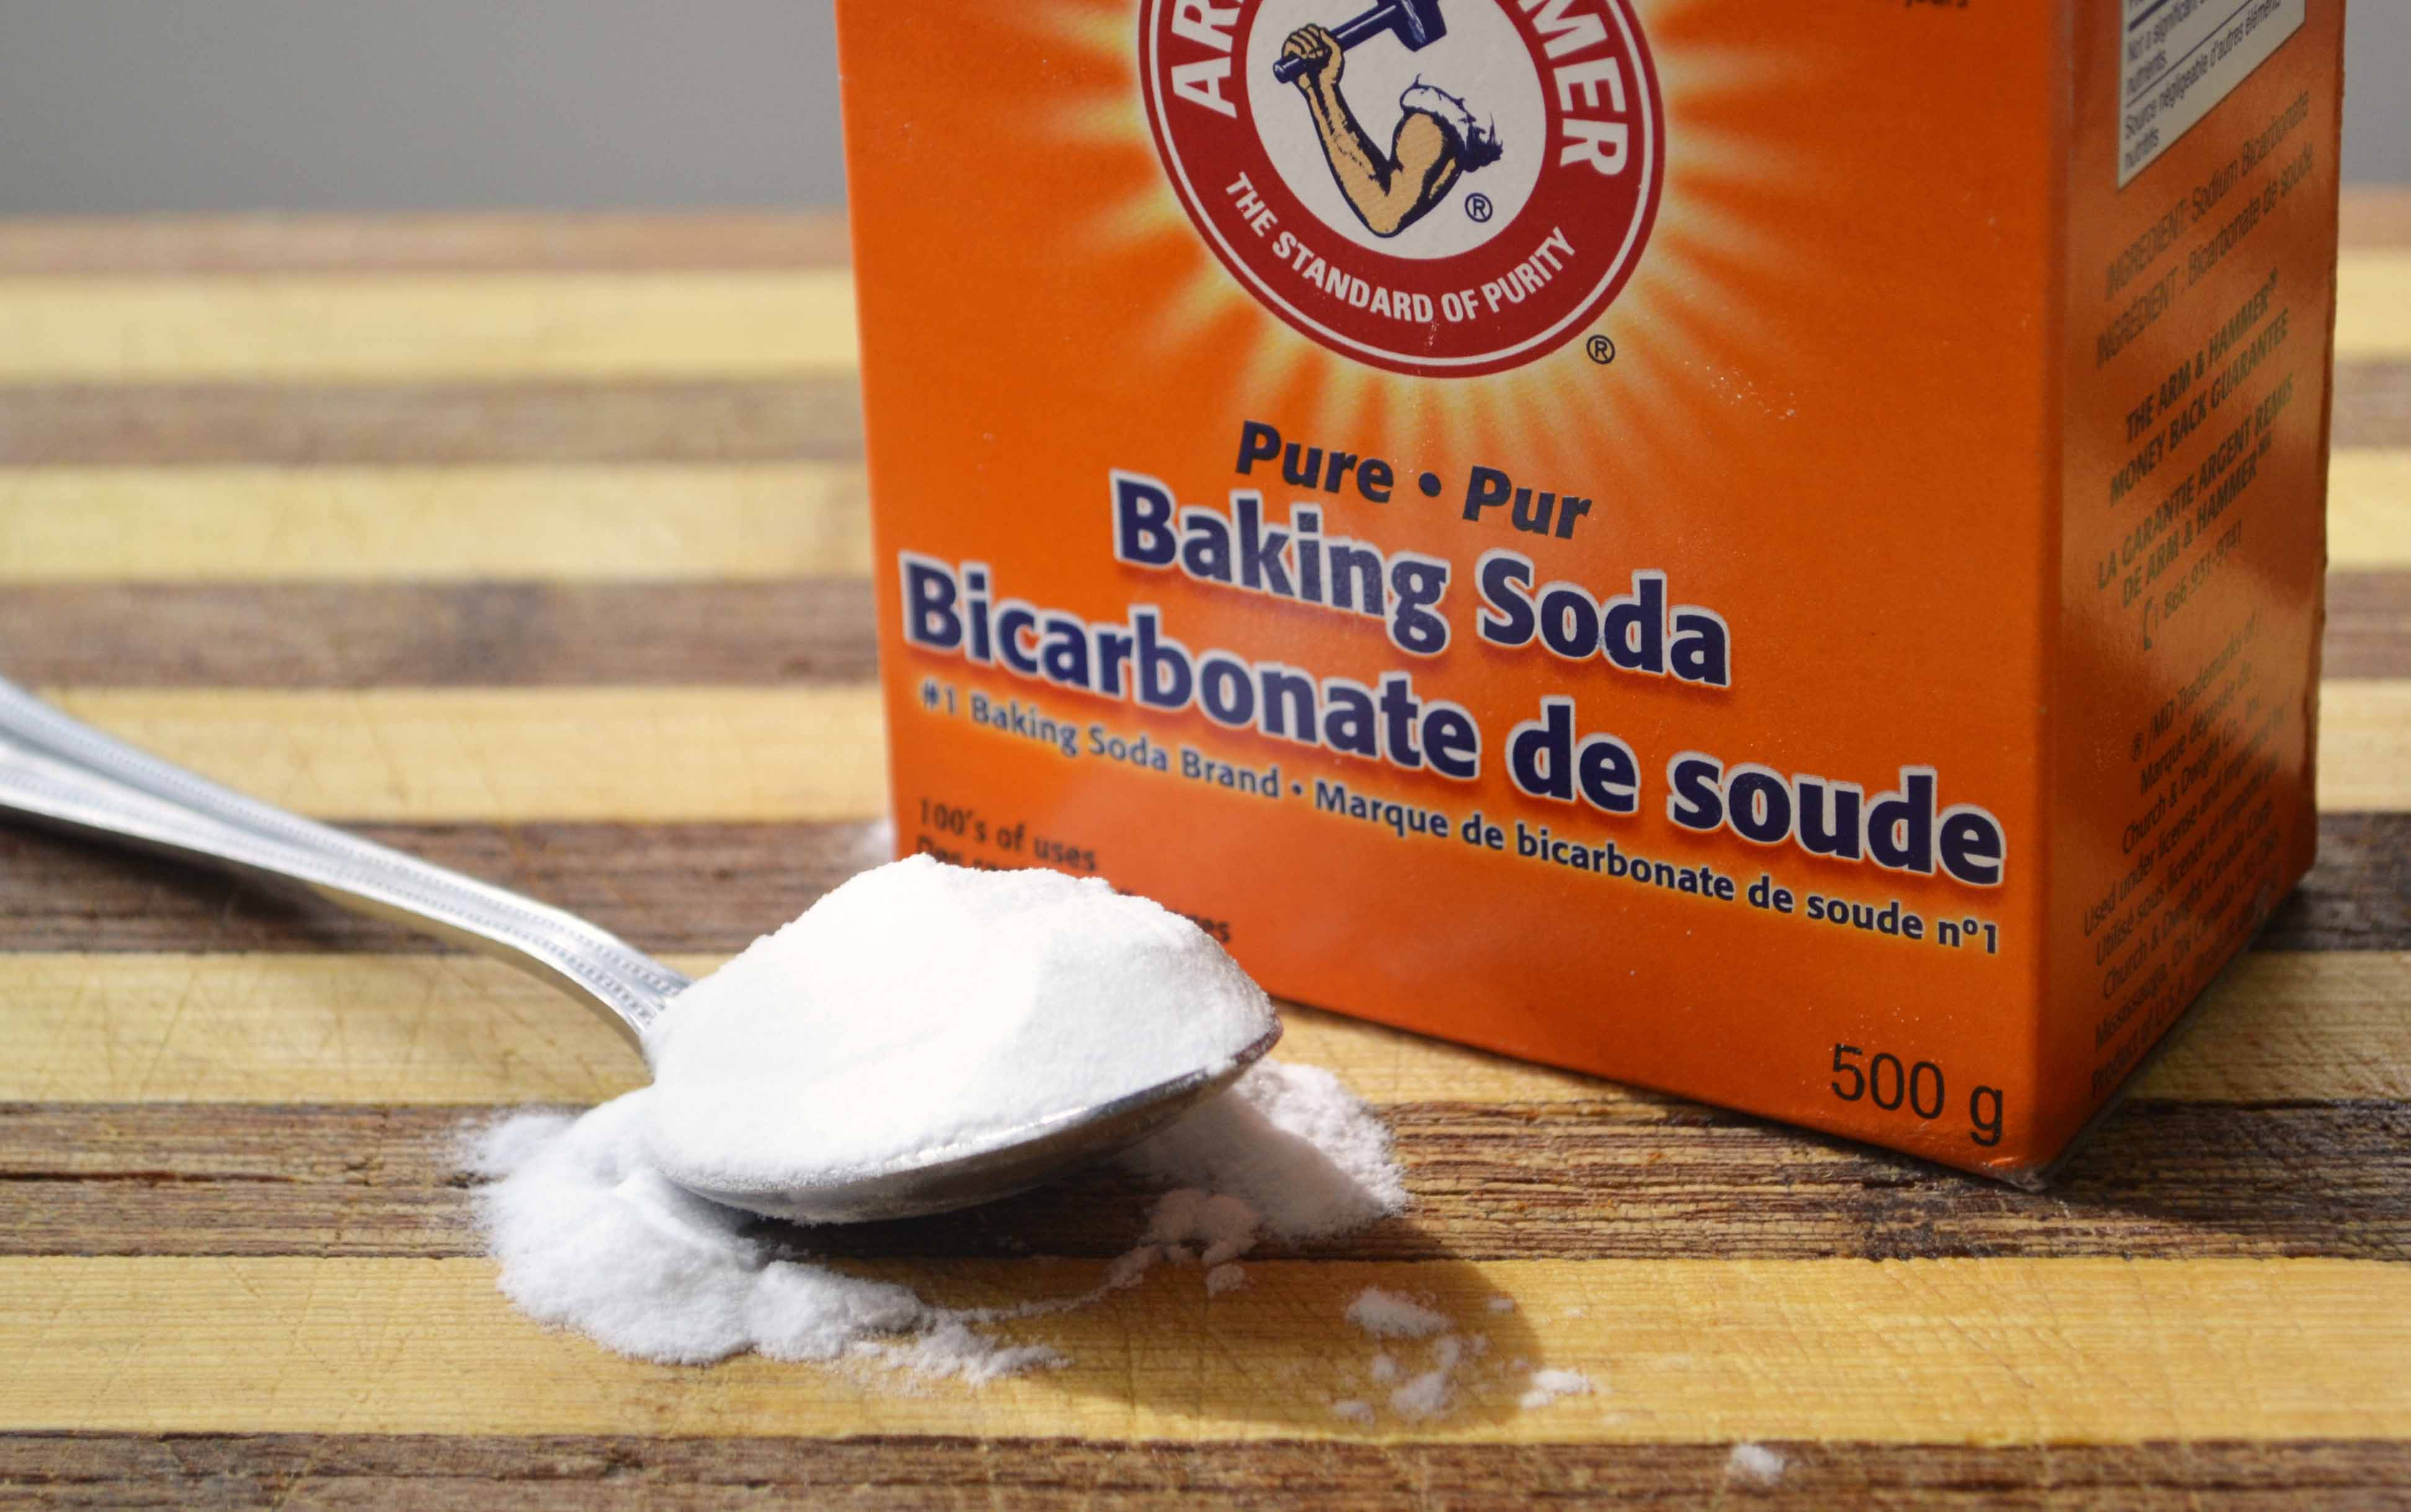 Baking soda has all sorts of uses